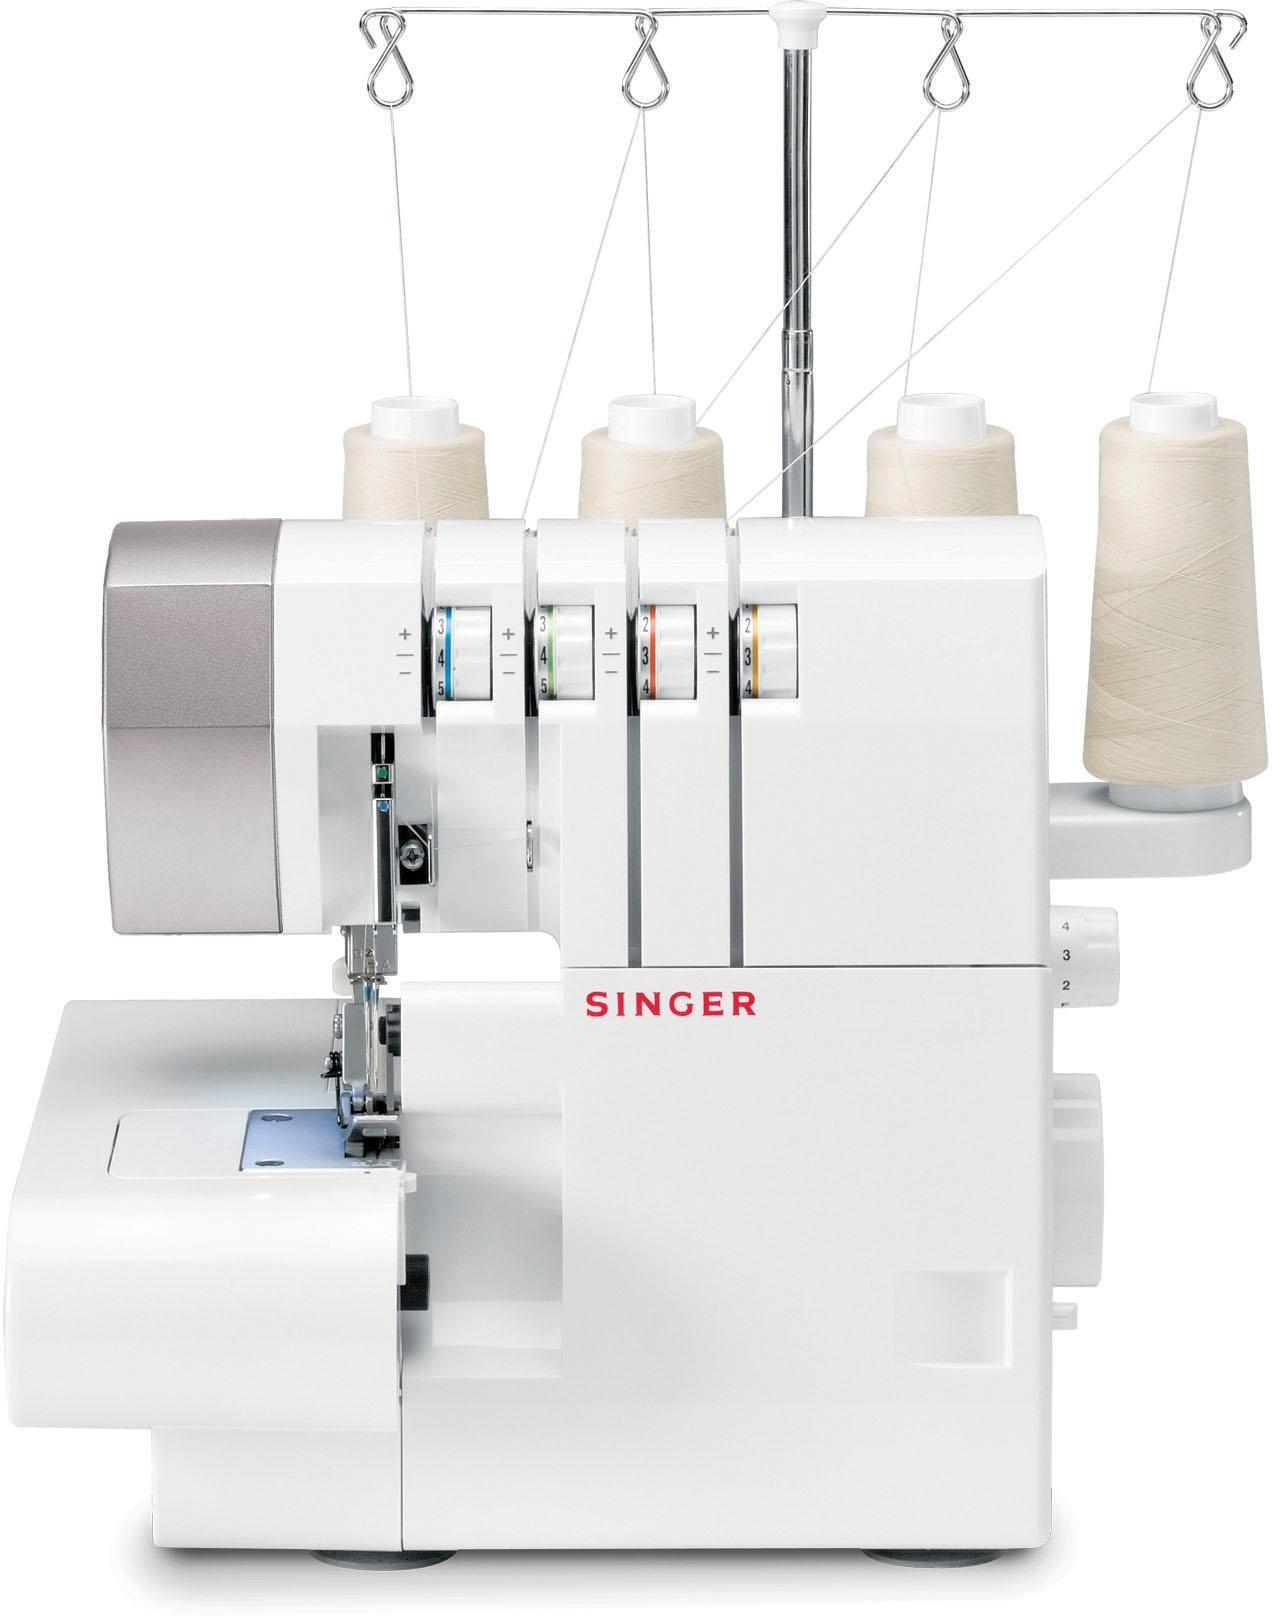 Singer Overlock-Nähmaschine OVERLOCK 14SH754, 6 Nähprogramme | Flur & Diele > Haushaltsgeräte > Strick und Nähmaschinen | Weiß | SINGER